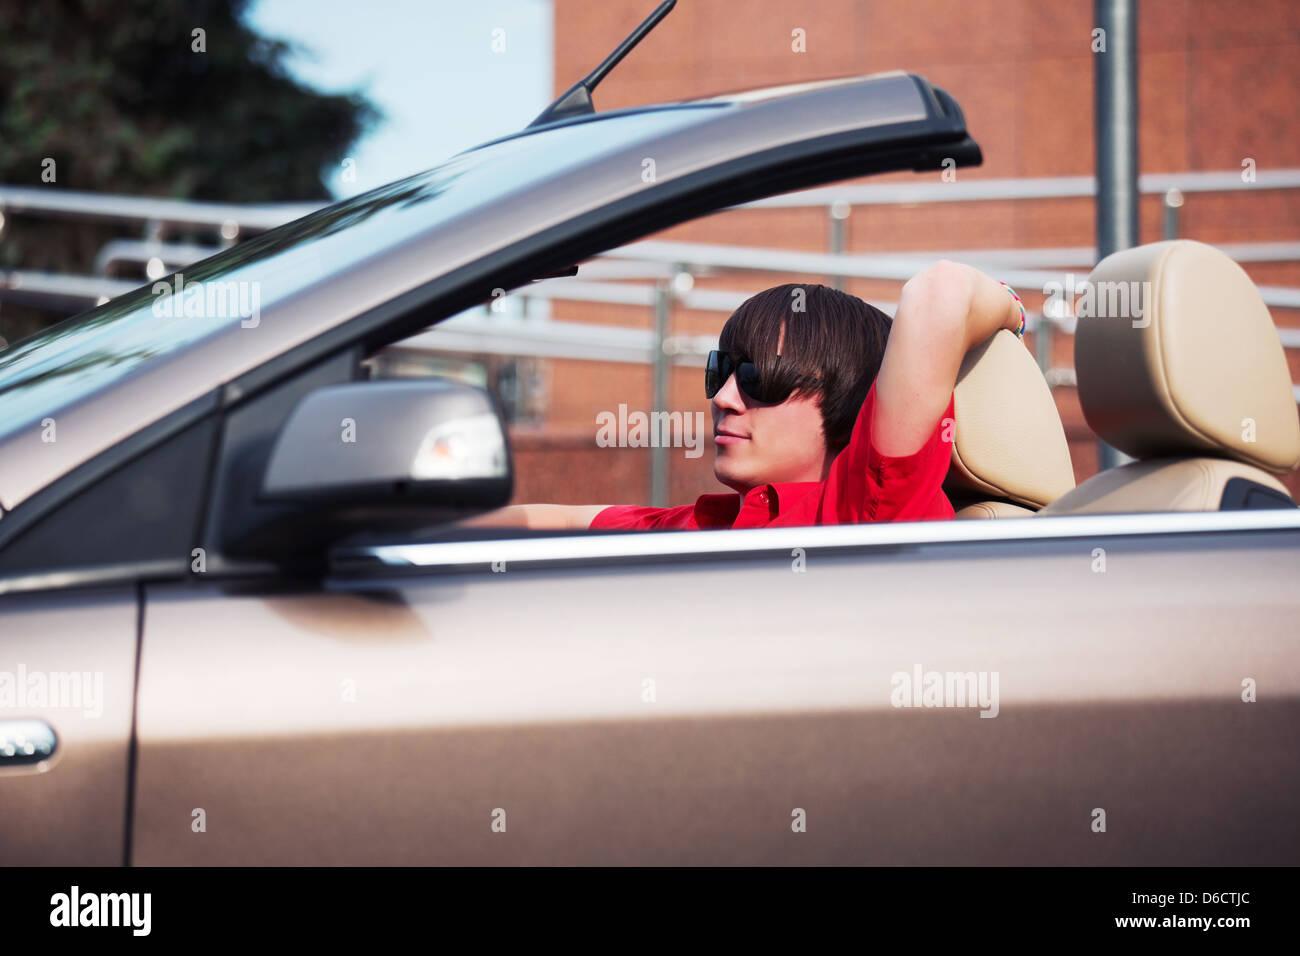 Young man driving a convertible car - Stock Image